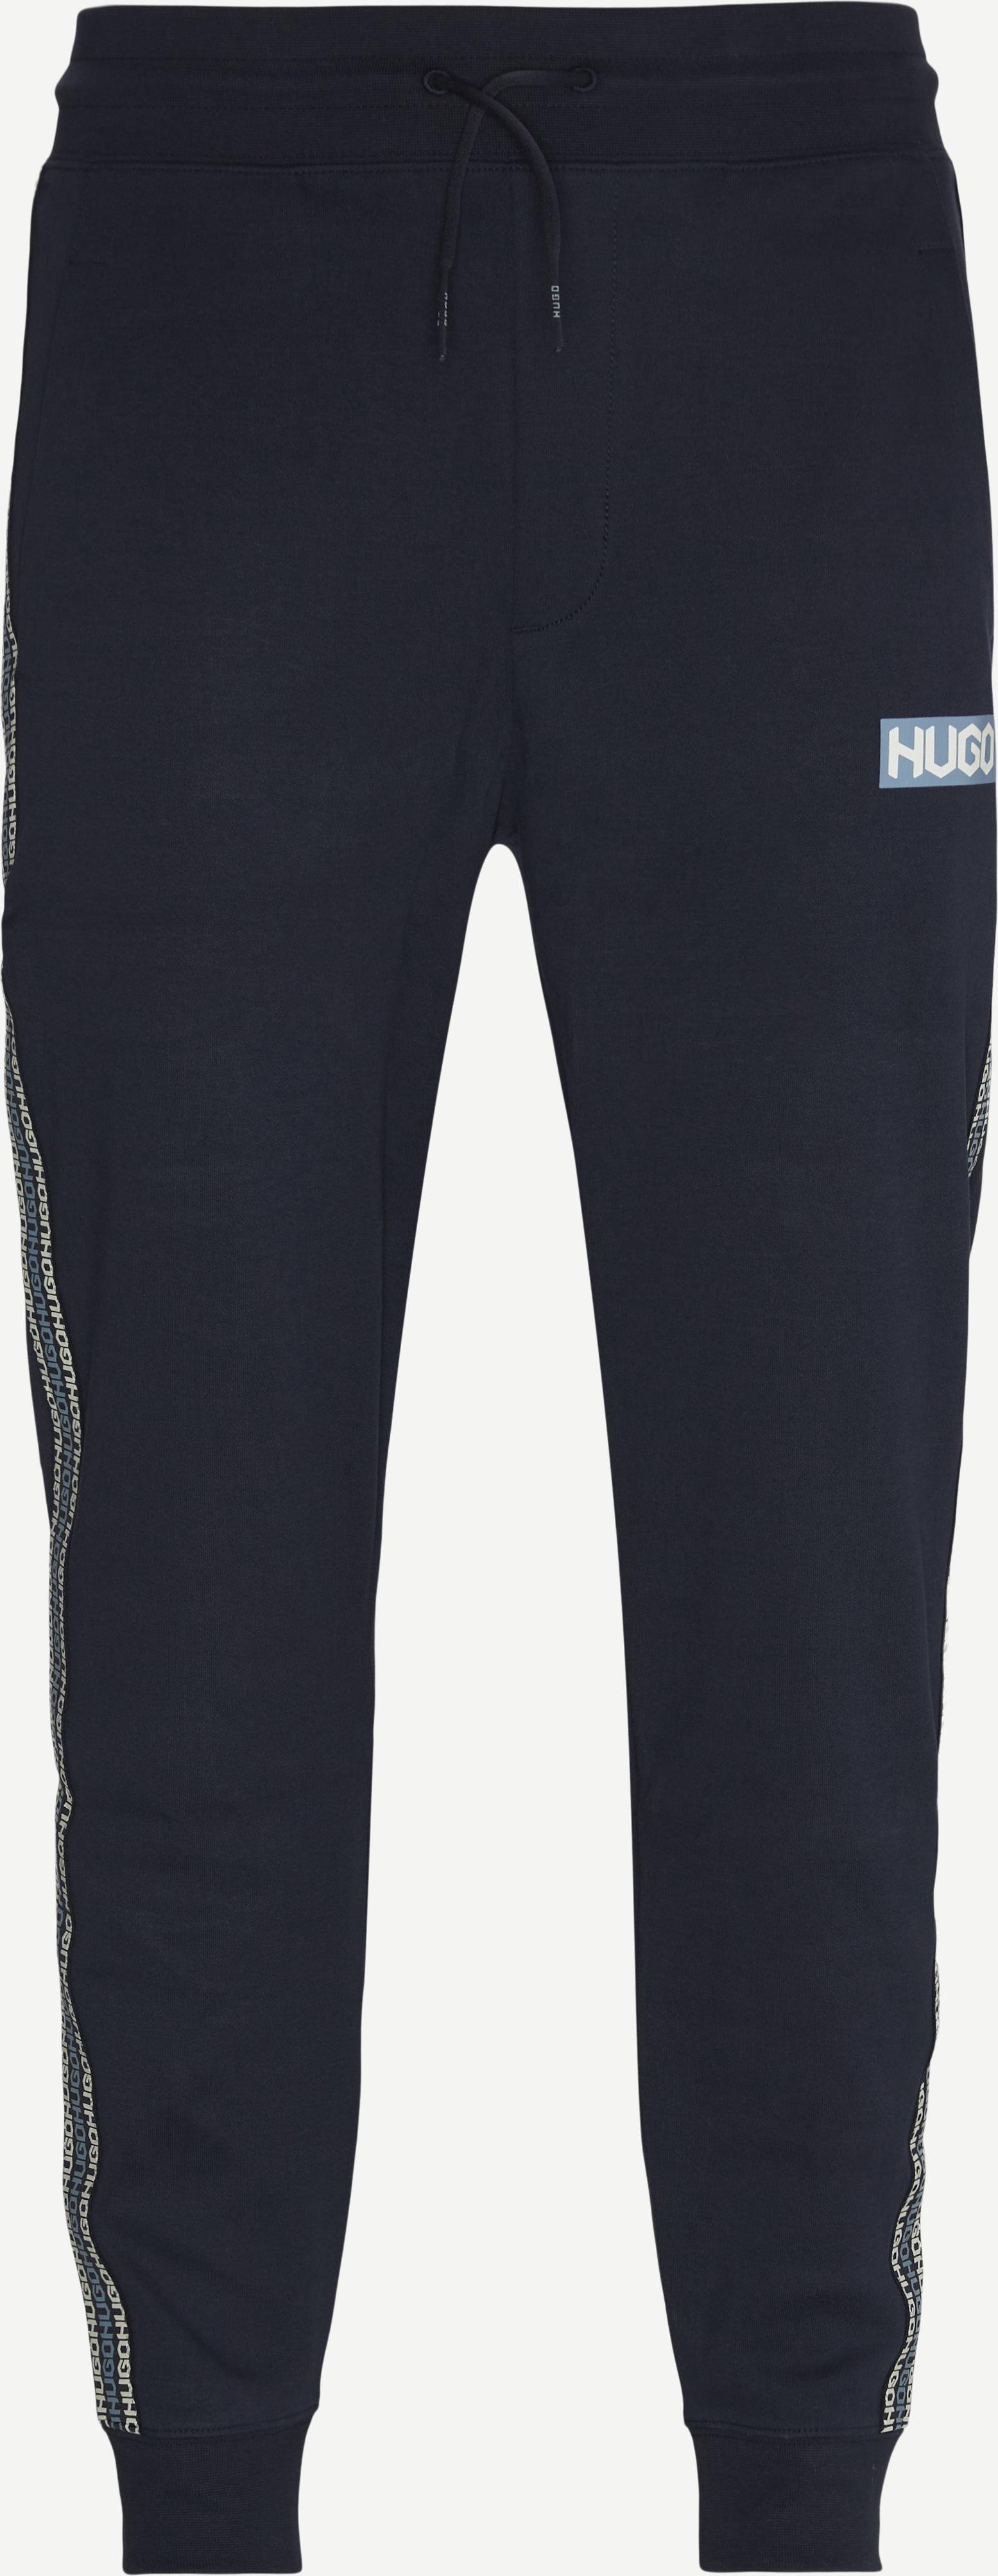 Hugo Sweatpant - Bukser - Regular - Blå